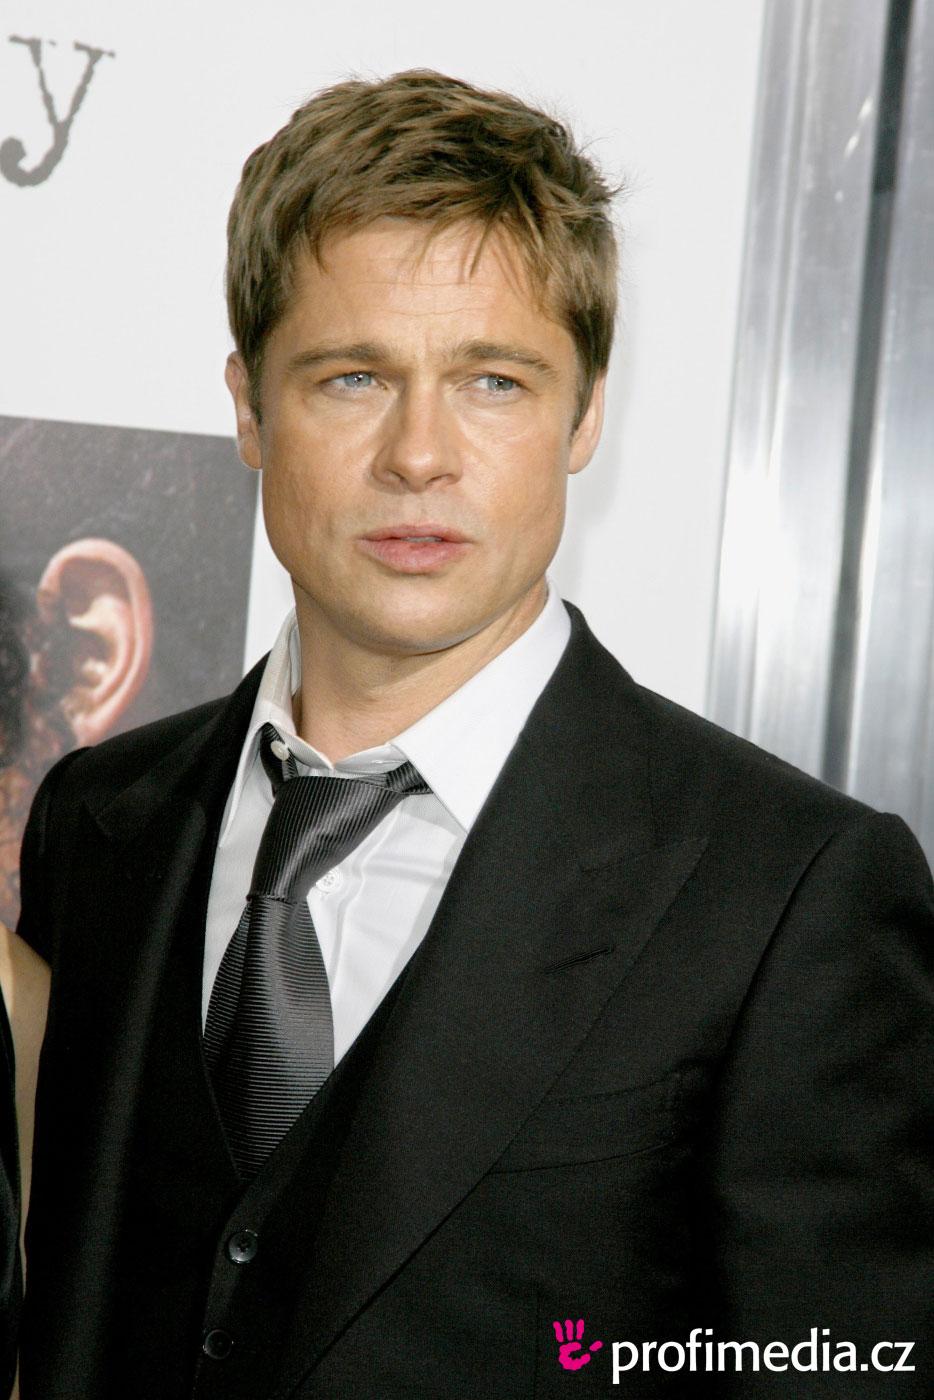 Brad Pitt Hairstyle Easyhairstyler